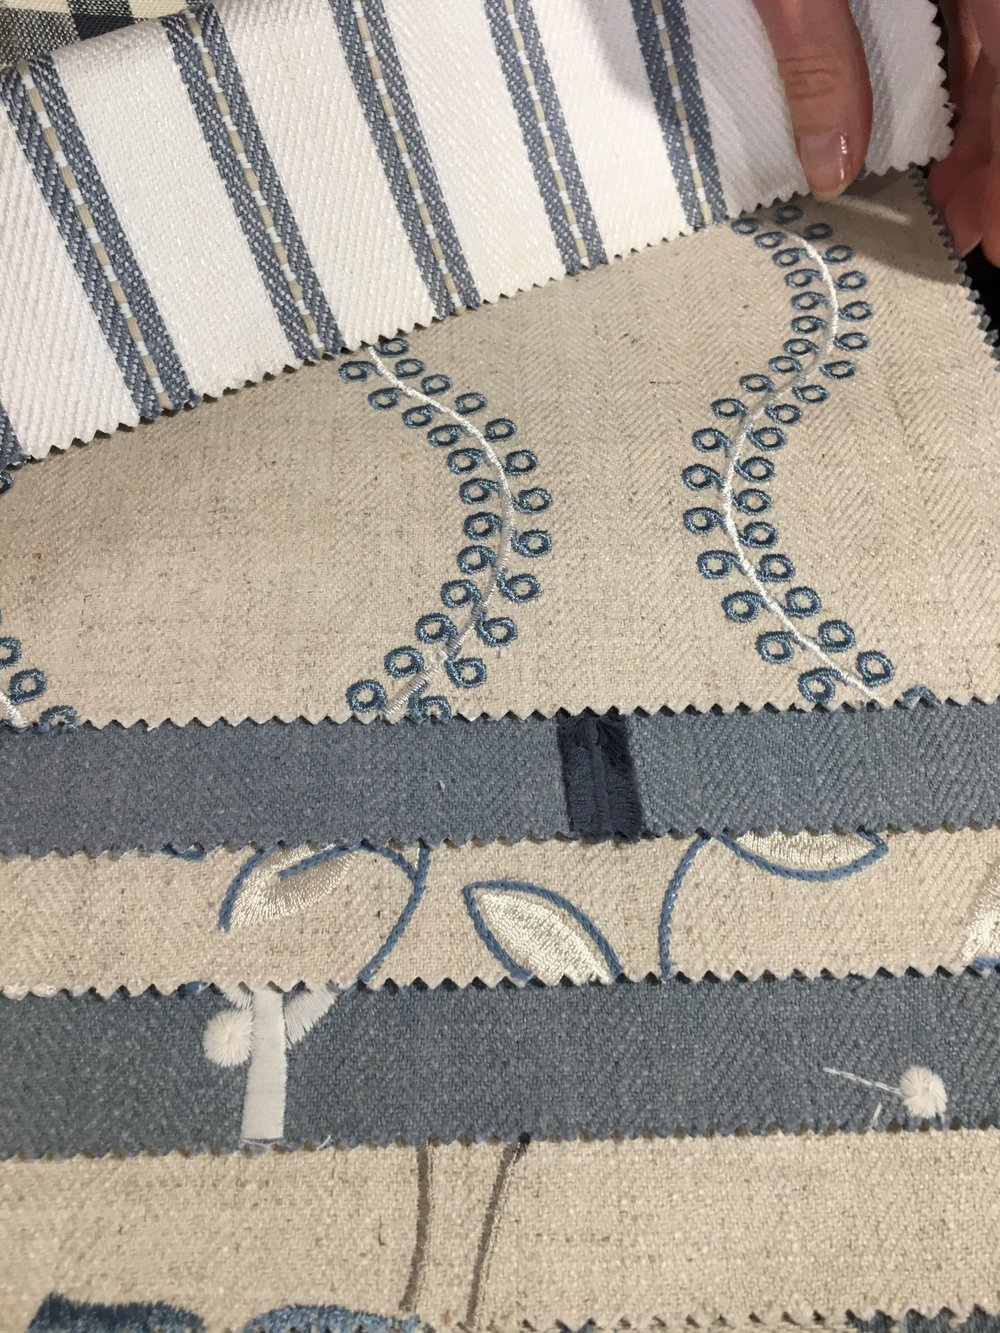 Fabric Books show co-ordinating fabrics within a colour range.